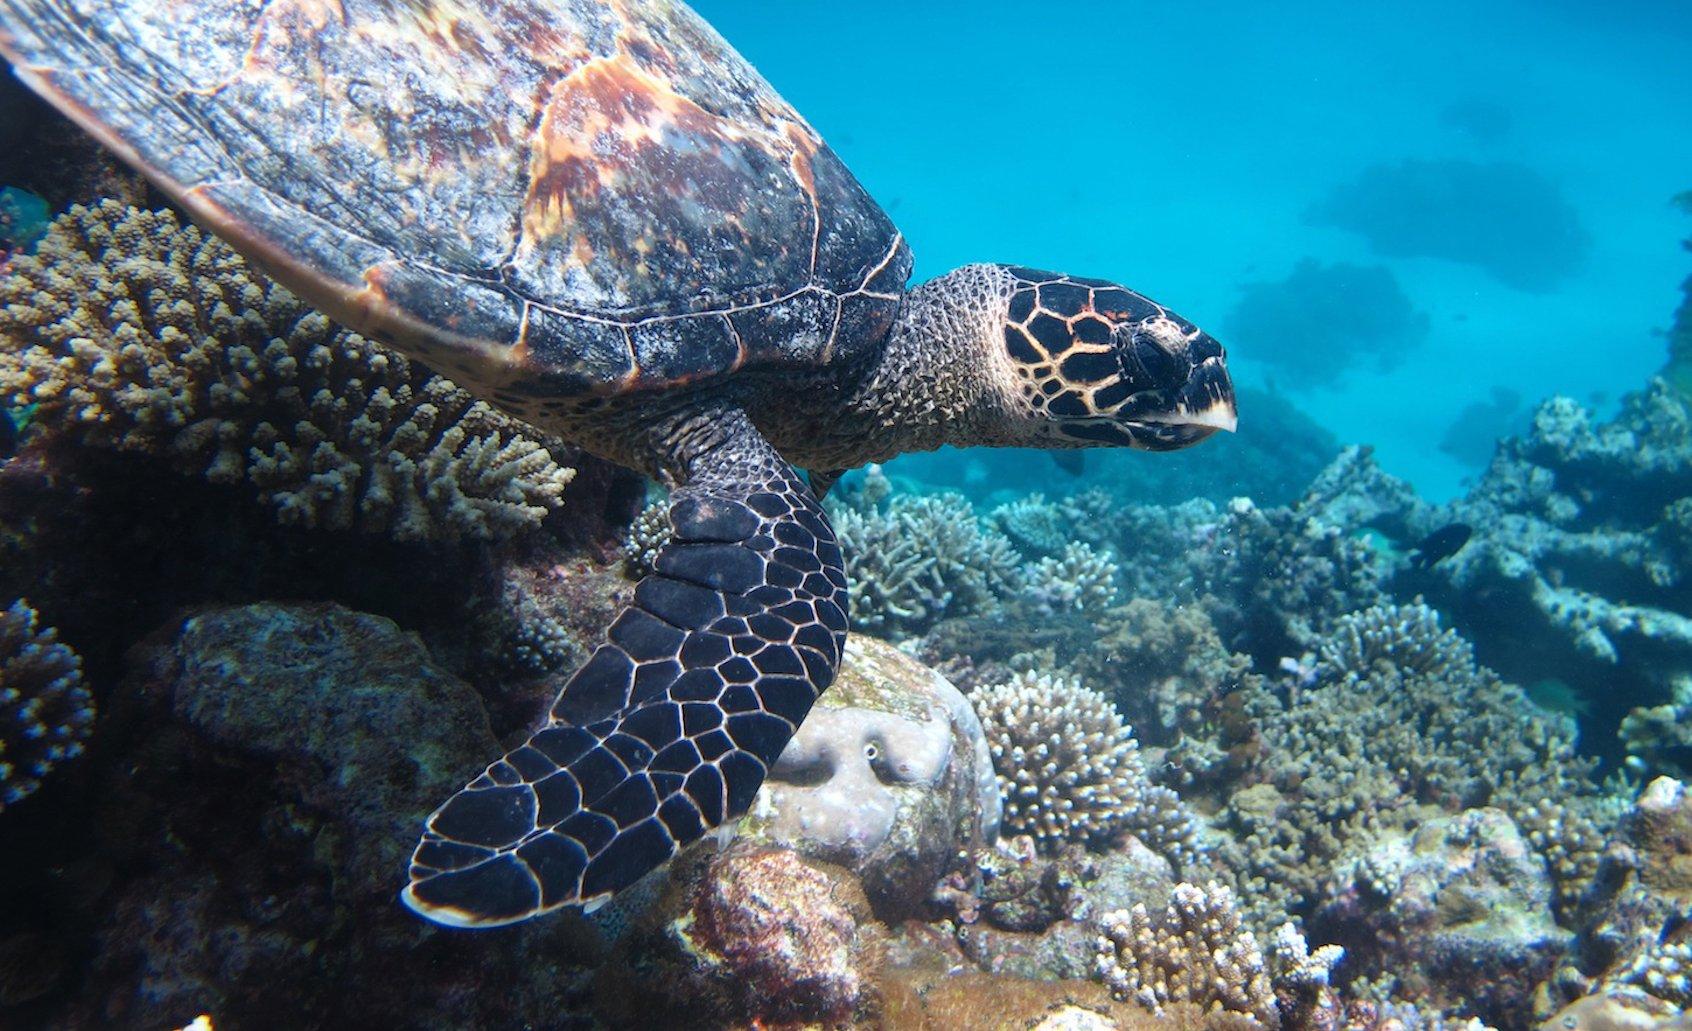 Coco Bodu Hiti Turtle